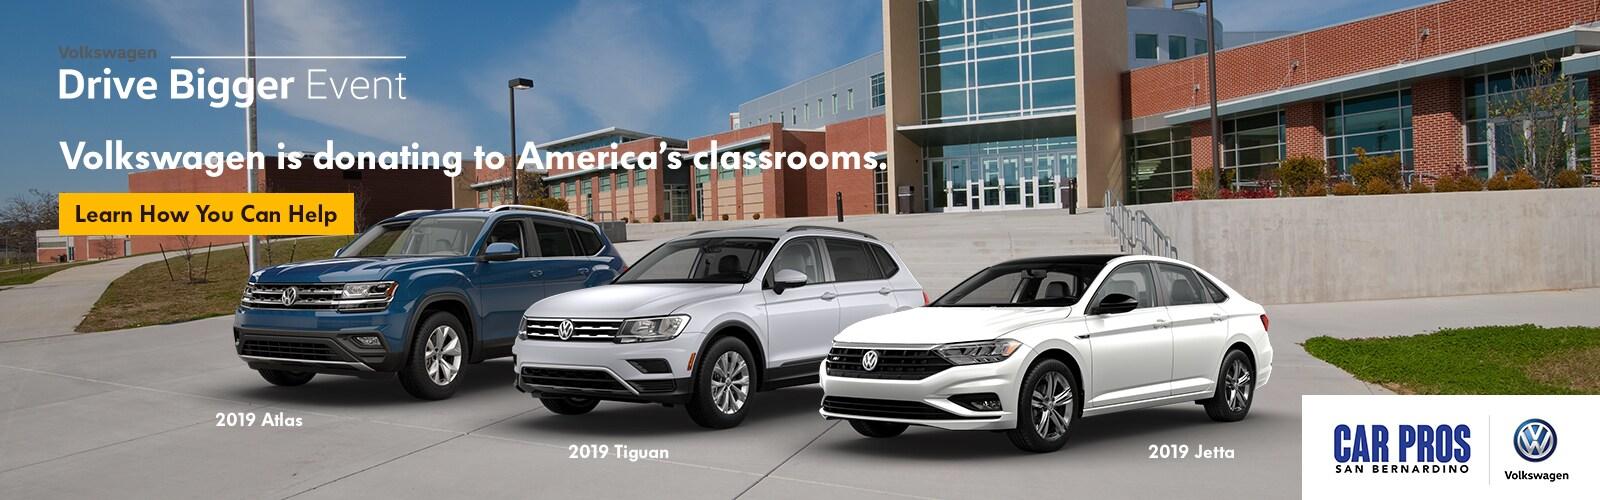 VW Dealership | San Bernardino | Car Pros Volkswagen